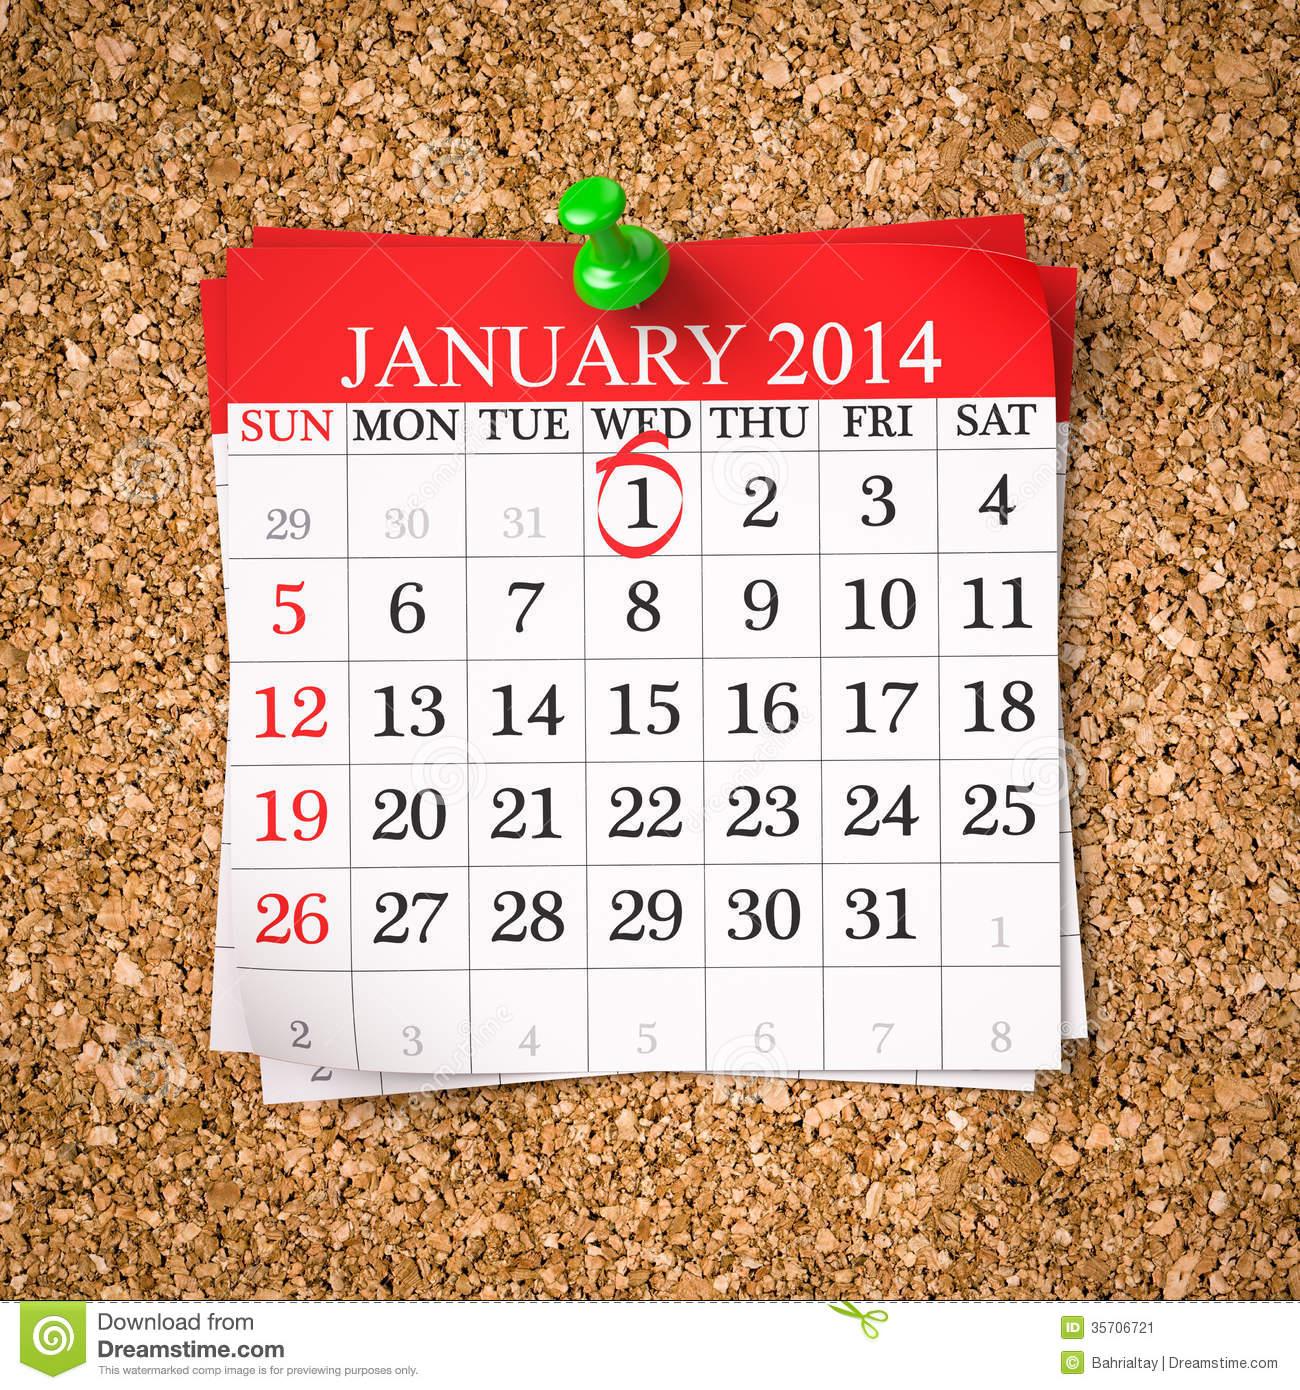 January 2014 calendar clipart png library Calendar clipart 2014 - ClipartFest png library